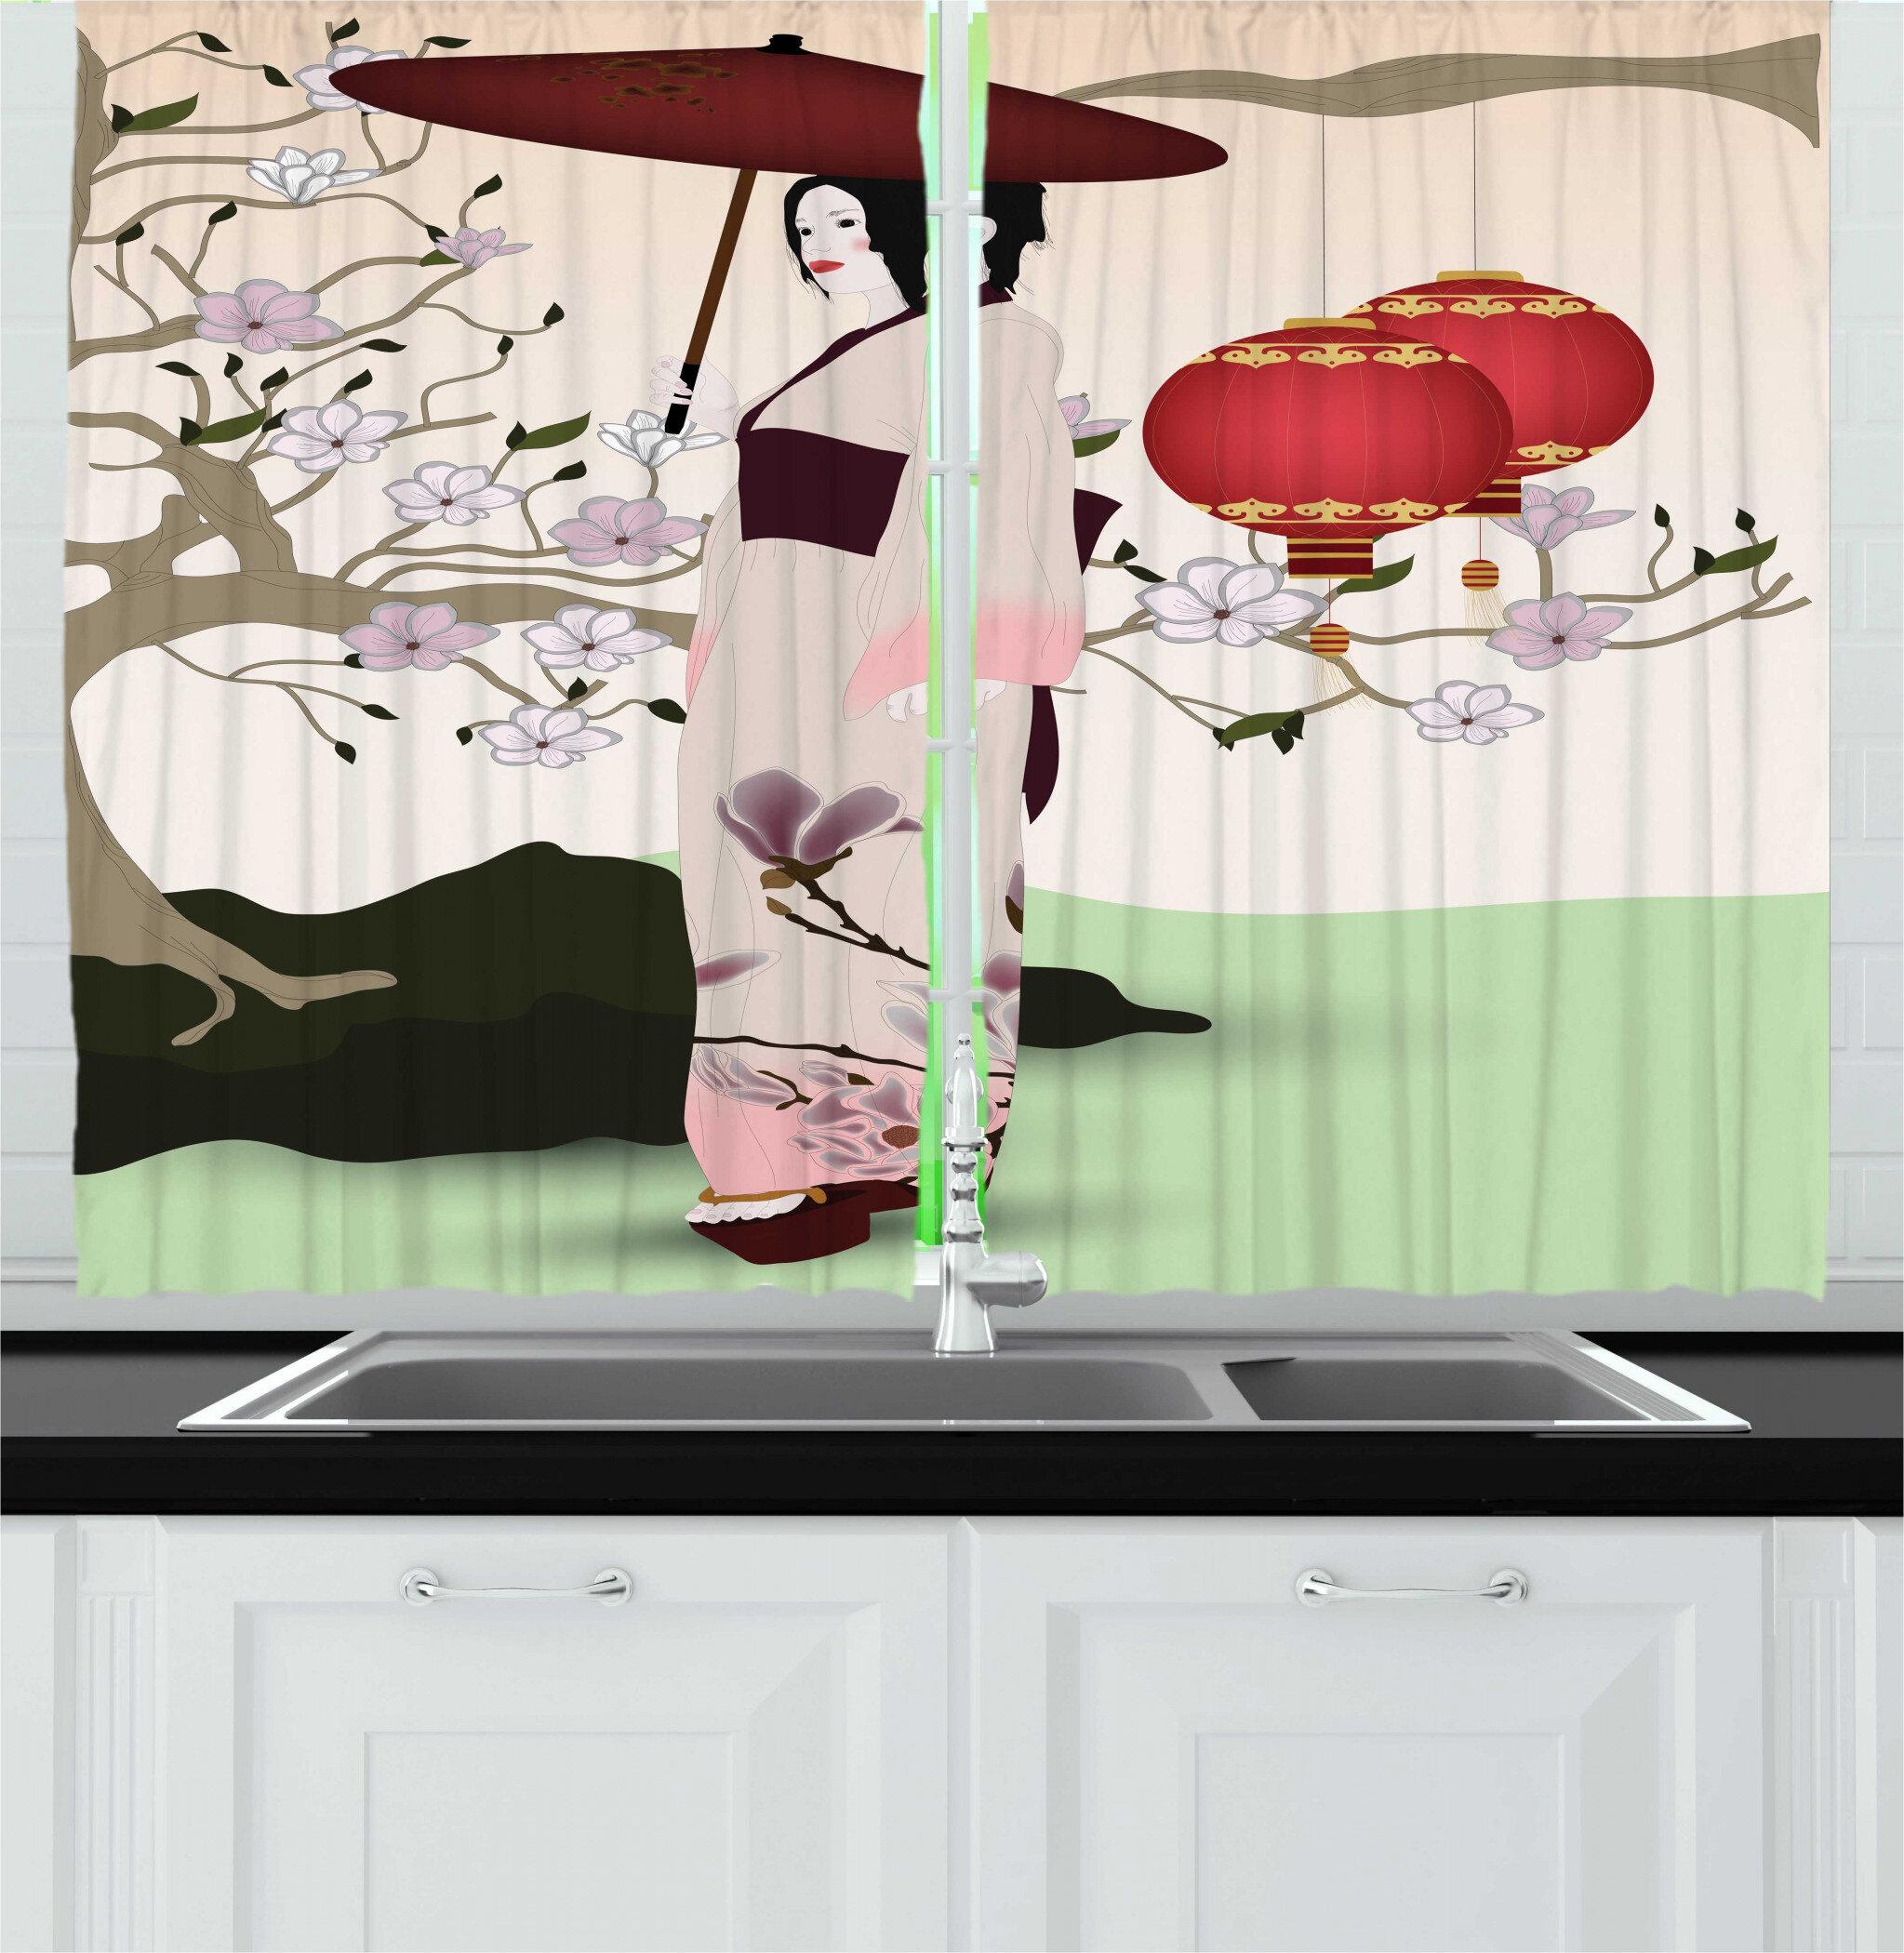 East Urban Home 2 Piece Umbrella Girl Inspired Geisha Scene With Traditional Oriental Garden Kitchen Curtain Set Wayfair